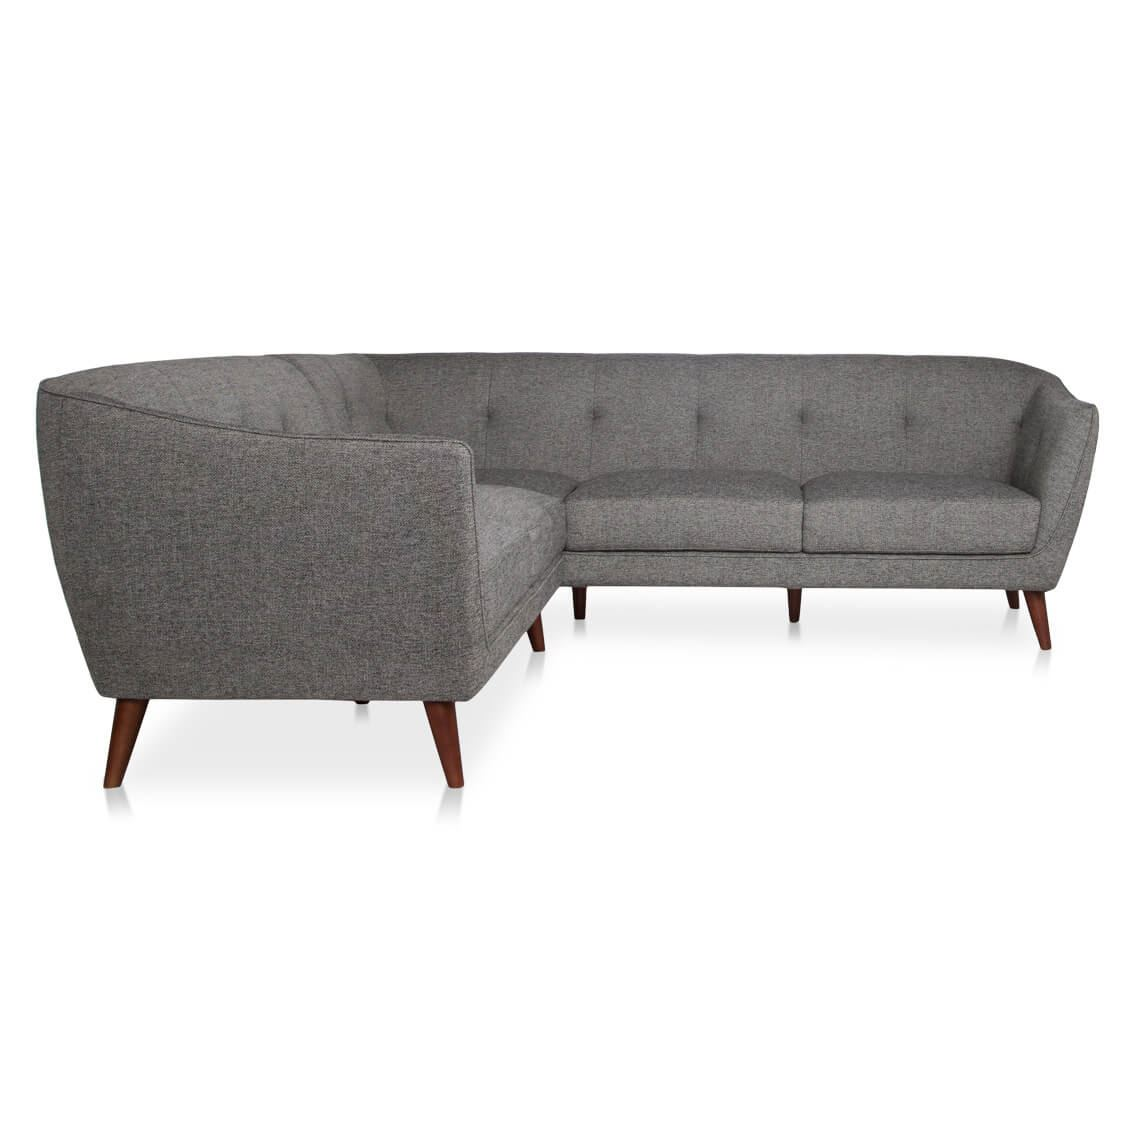 Tremendous Kai 5 Seat Fabric Modular With Corner Terminal In 2019 Spiritservingveterans Wood Chair Design Ideas Spiritservingveteransorg